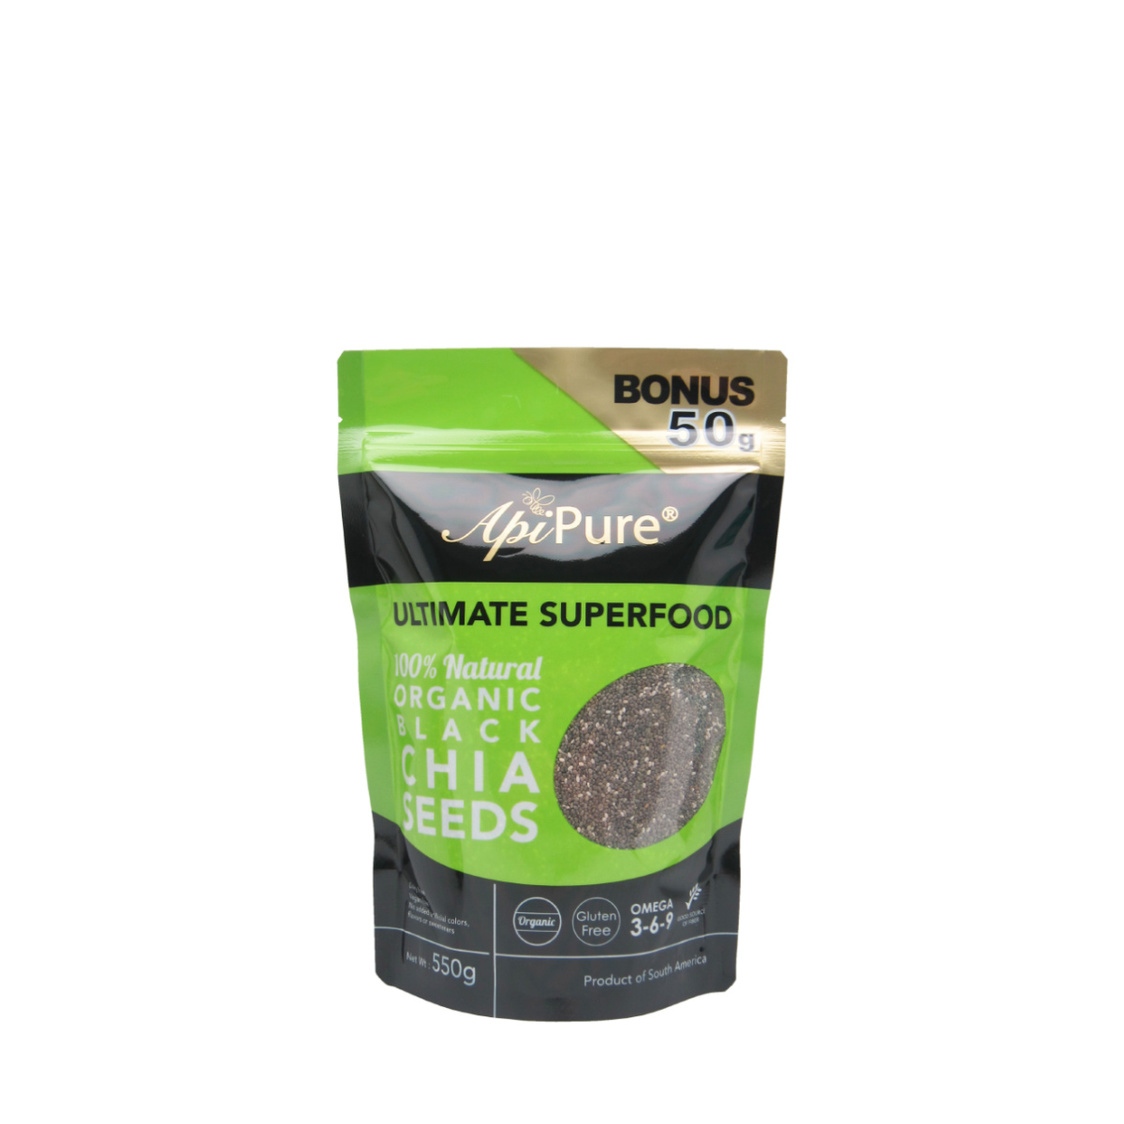 Apipure Organic Black Chia Seeds 550g